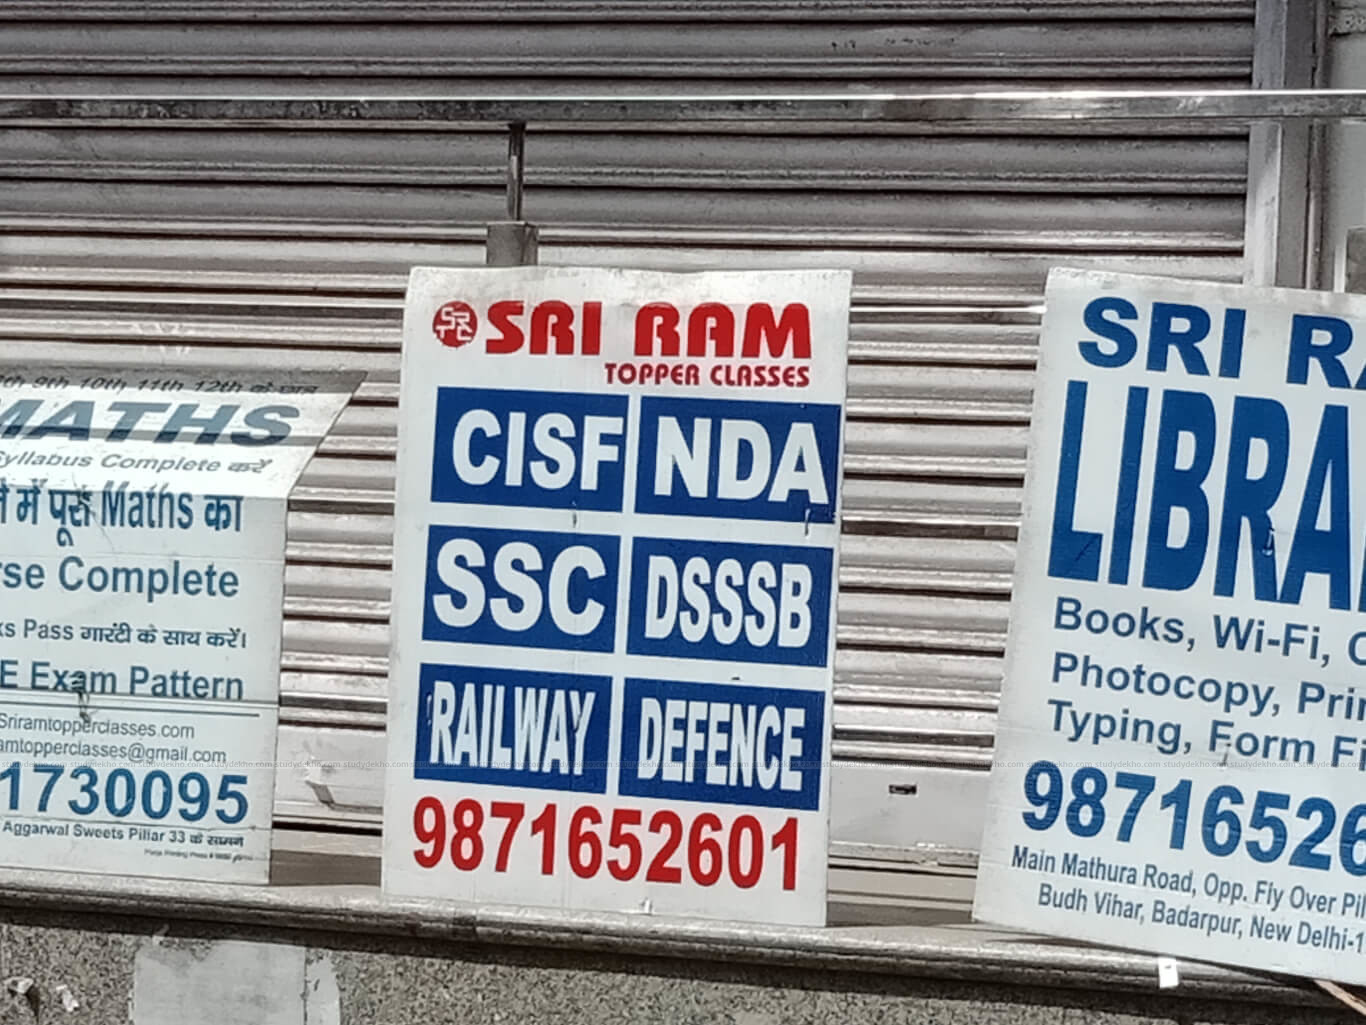 SRI RAM TOPPER CLASSES Gallery